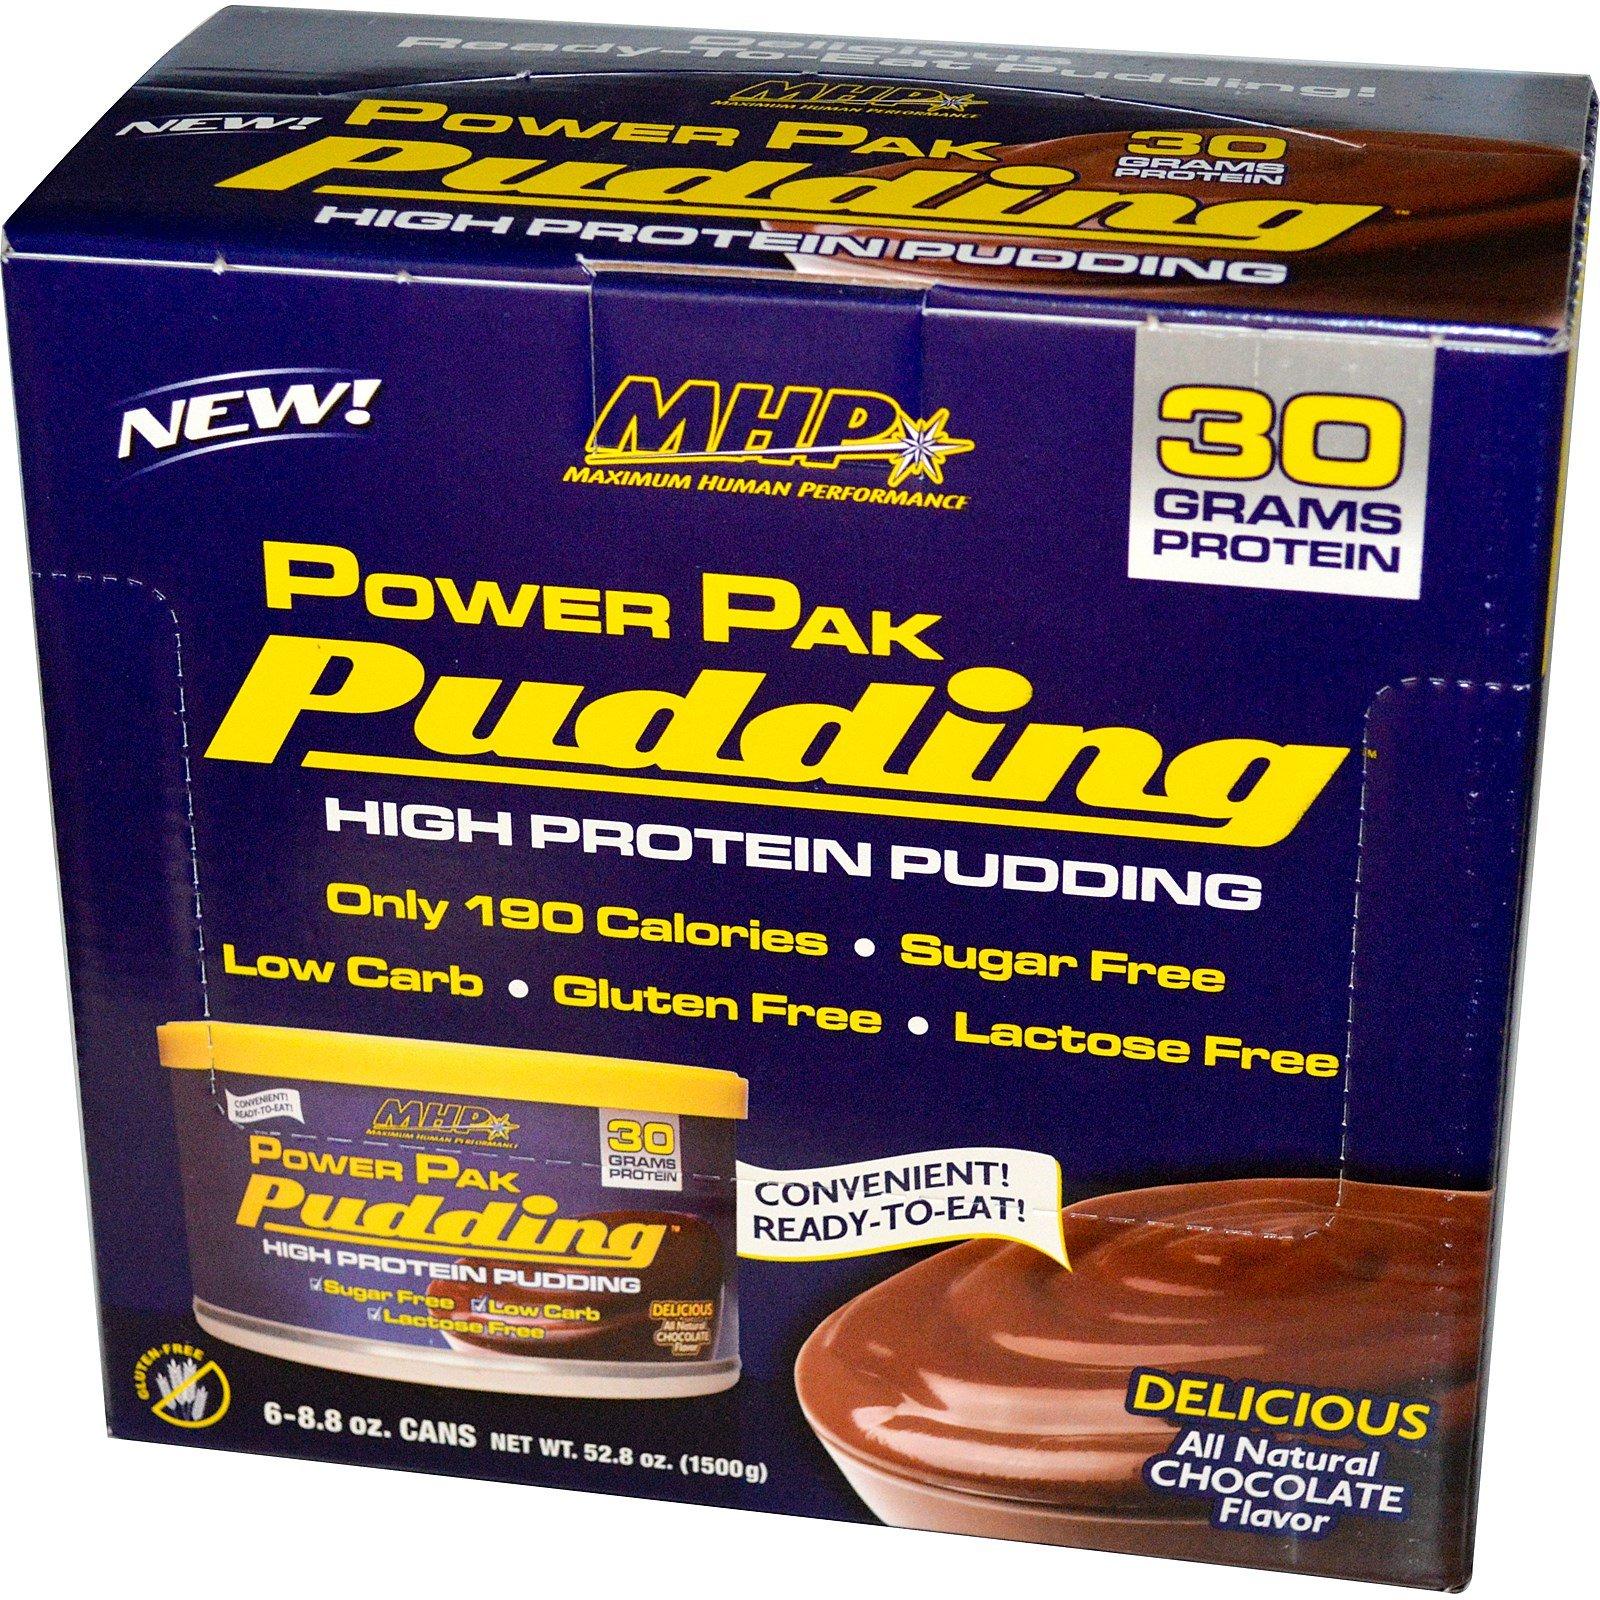 Maximum Human Performance, LLC, Power Pak Pudding, Chocolate, 6 Cans, 8.8 oz (250 g) Each - 2pc by Maximum Human Performance